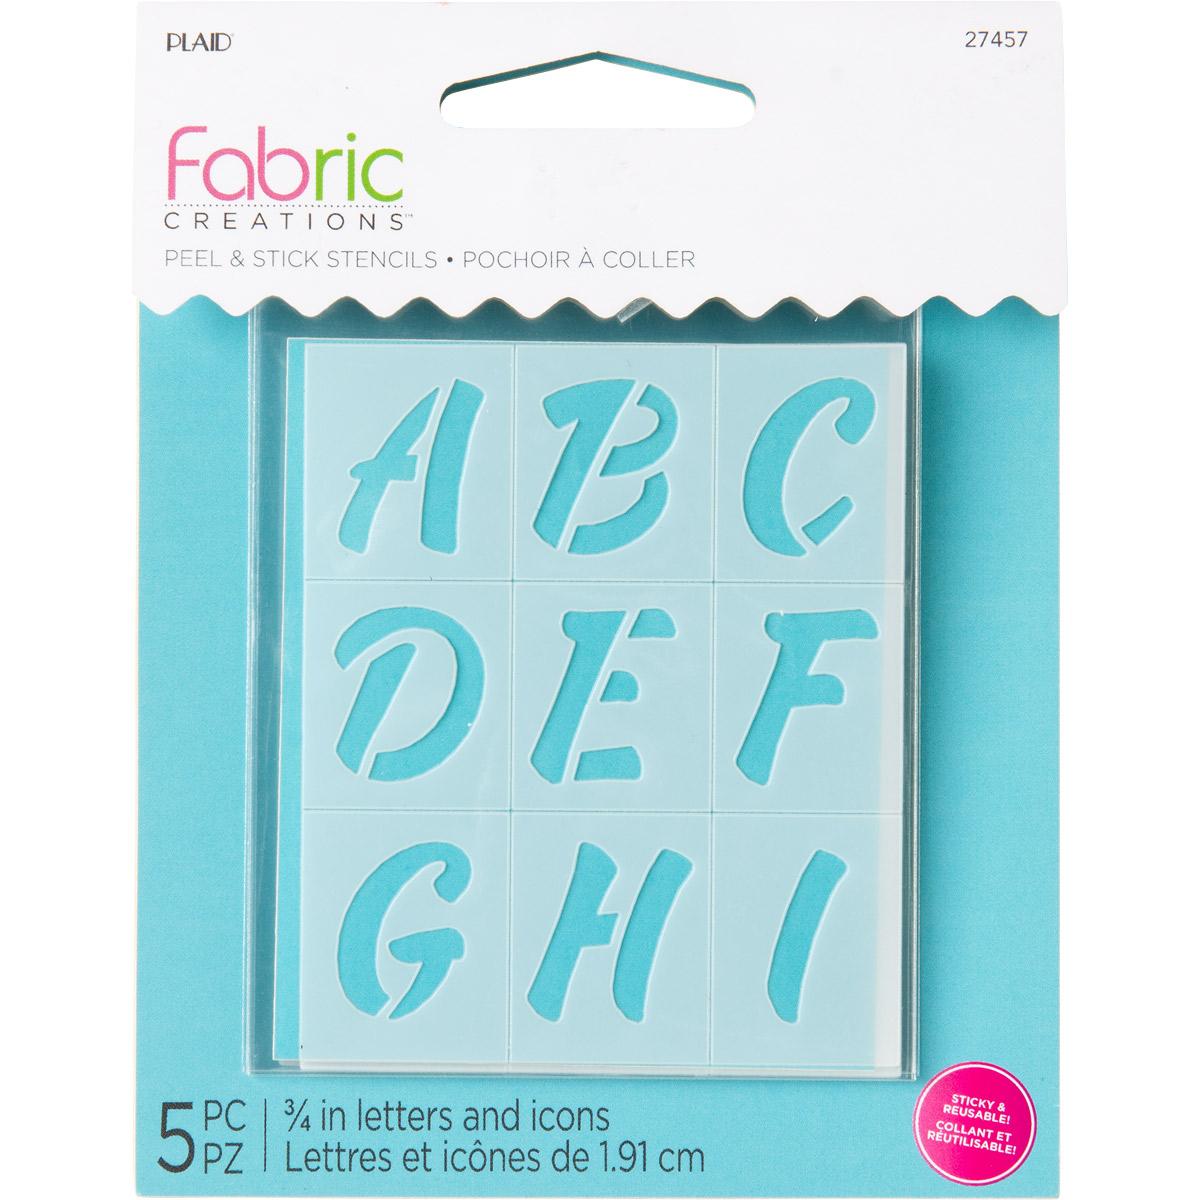 Fabric Creations™ Adhesive Stencils - Mini - Alphabet Sweets, 2-1/2